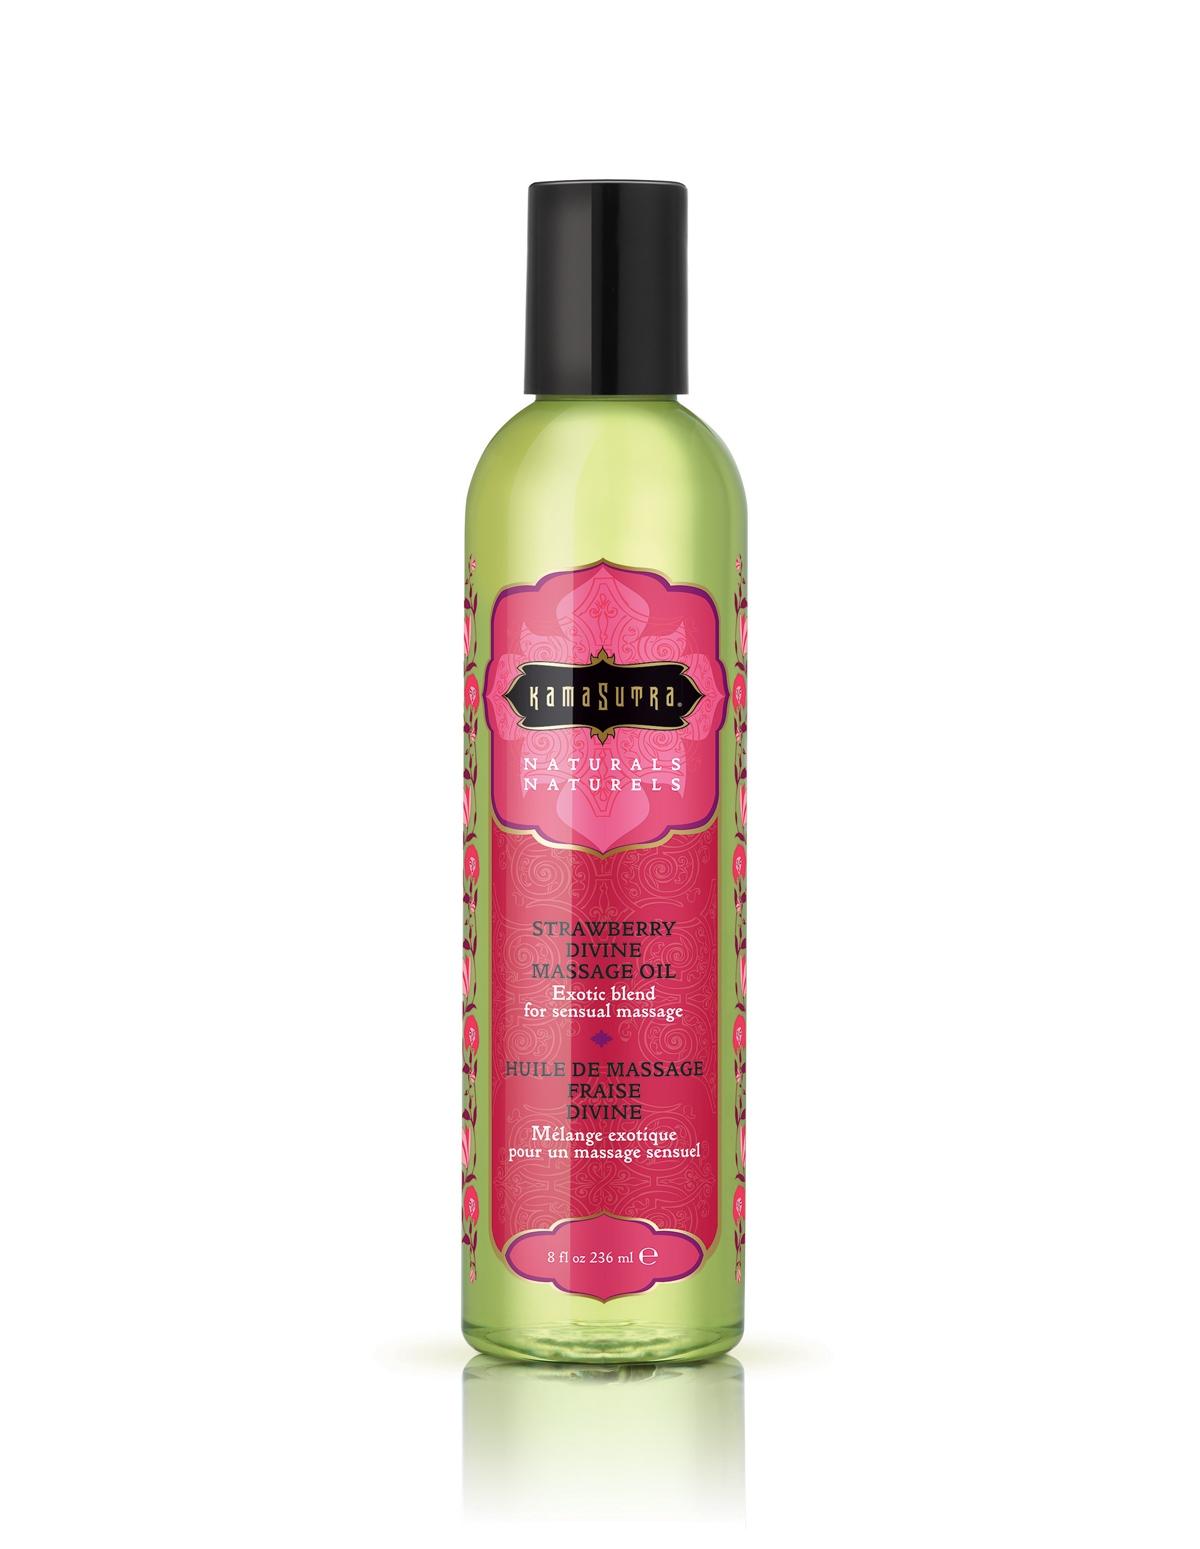 Strawberry Divine Massage Oil